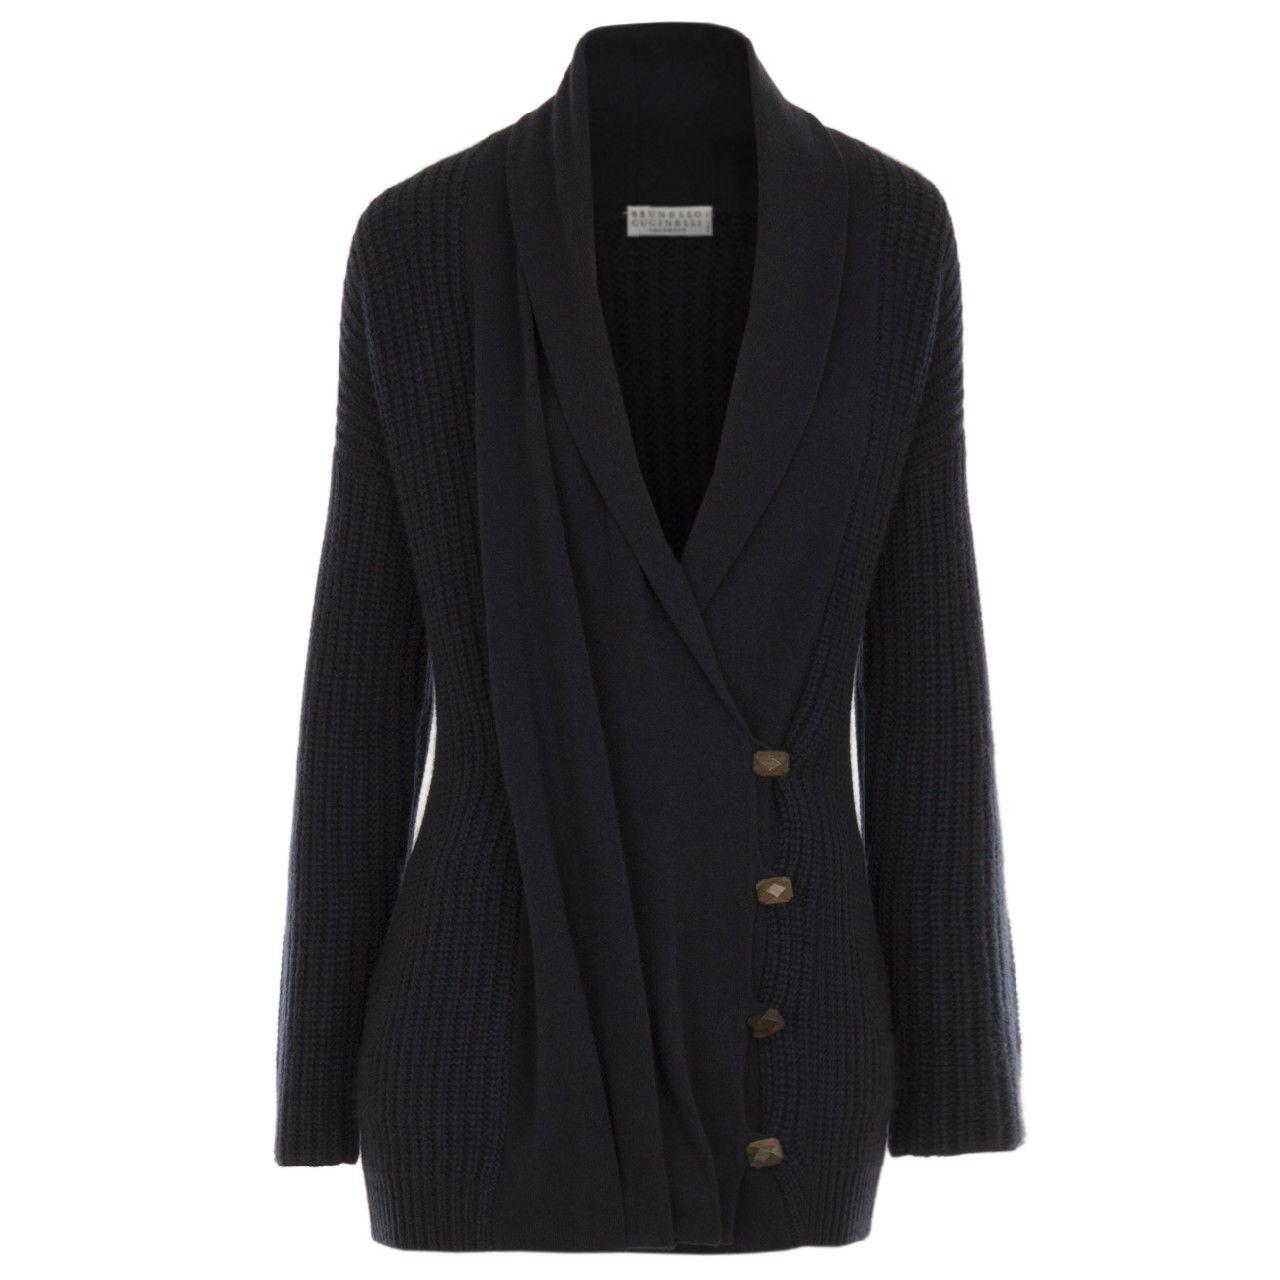 Hirshleifers - Brunello Cucinelli - Asymmetric Drape Front Cardigan (Navy), $2,460.00 (http://www.hirshleifers.com/ready-to-wear/tops/brunello-cucinelli-asymmetric-drape-front-cardigan-navy/)